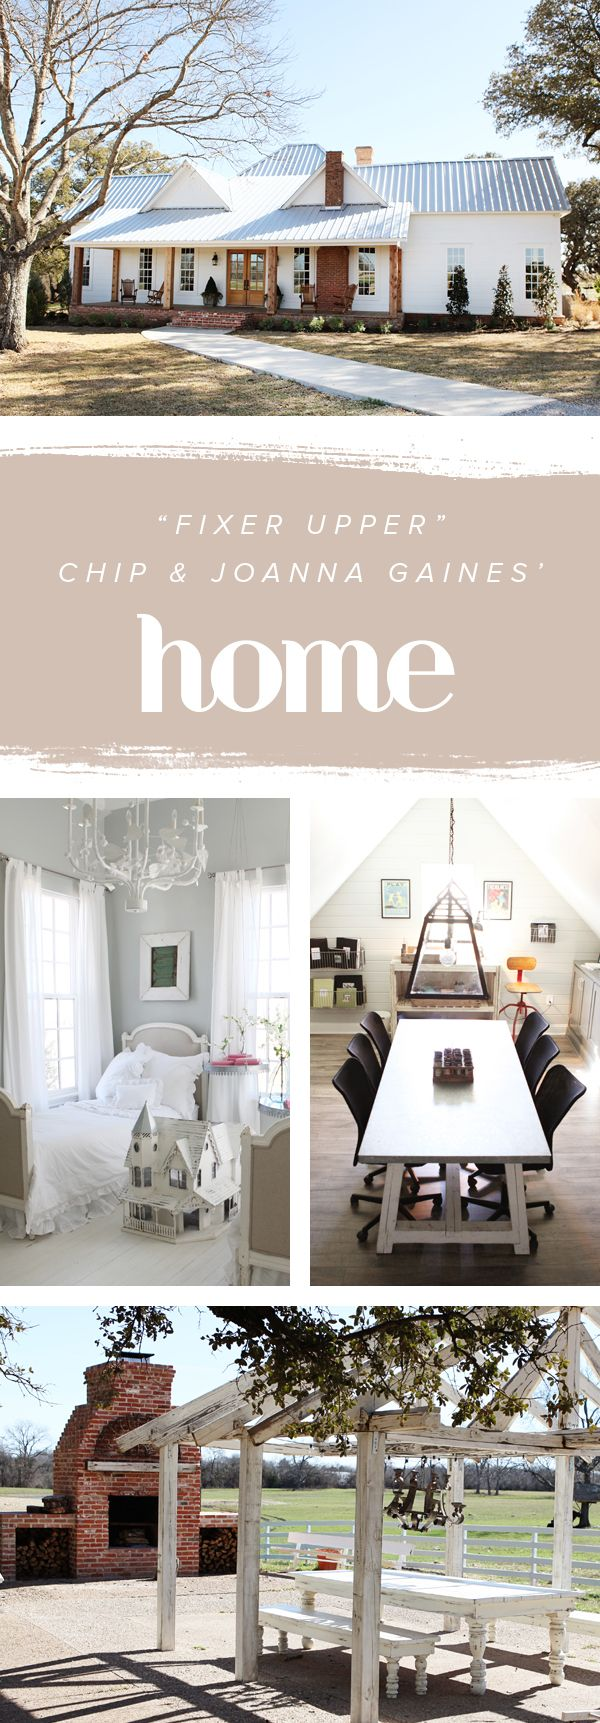 tour chip and joanna gaines 39 very own 39 fixer upper 39 farmhouse zuk nftiges haus wohnen und. Black Bedroom Furniture Sets. Home Design Ideas